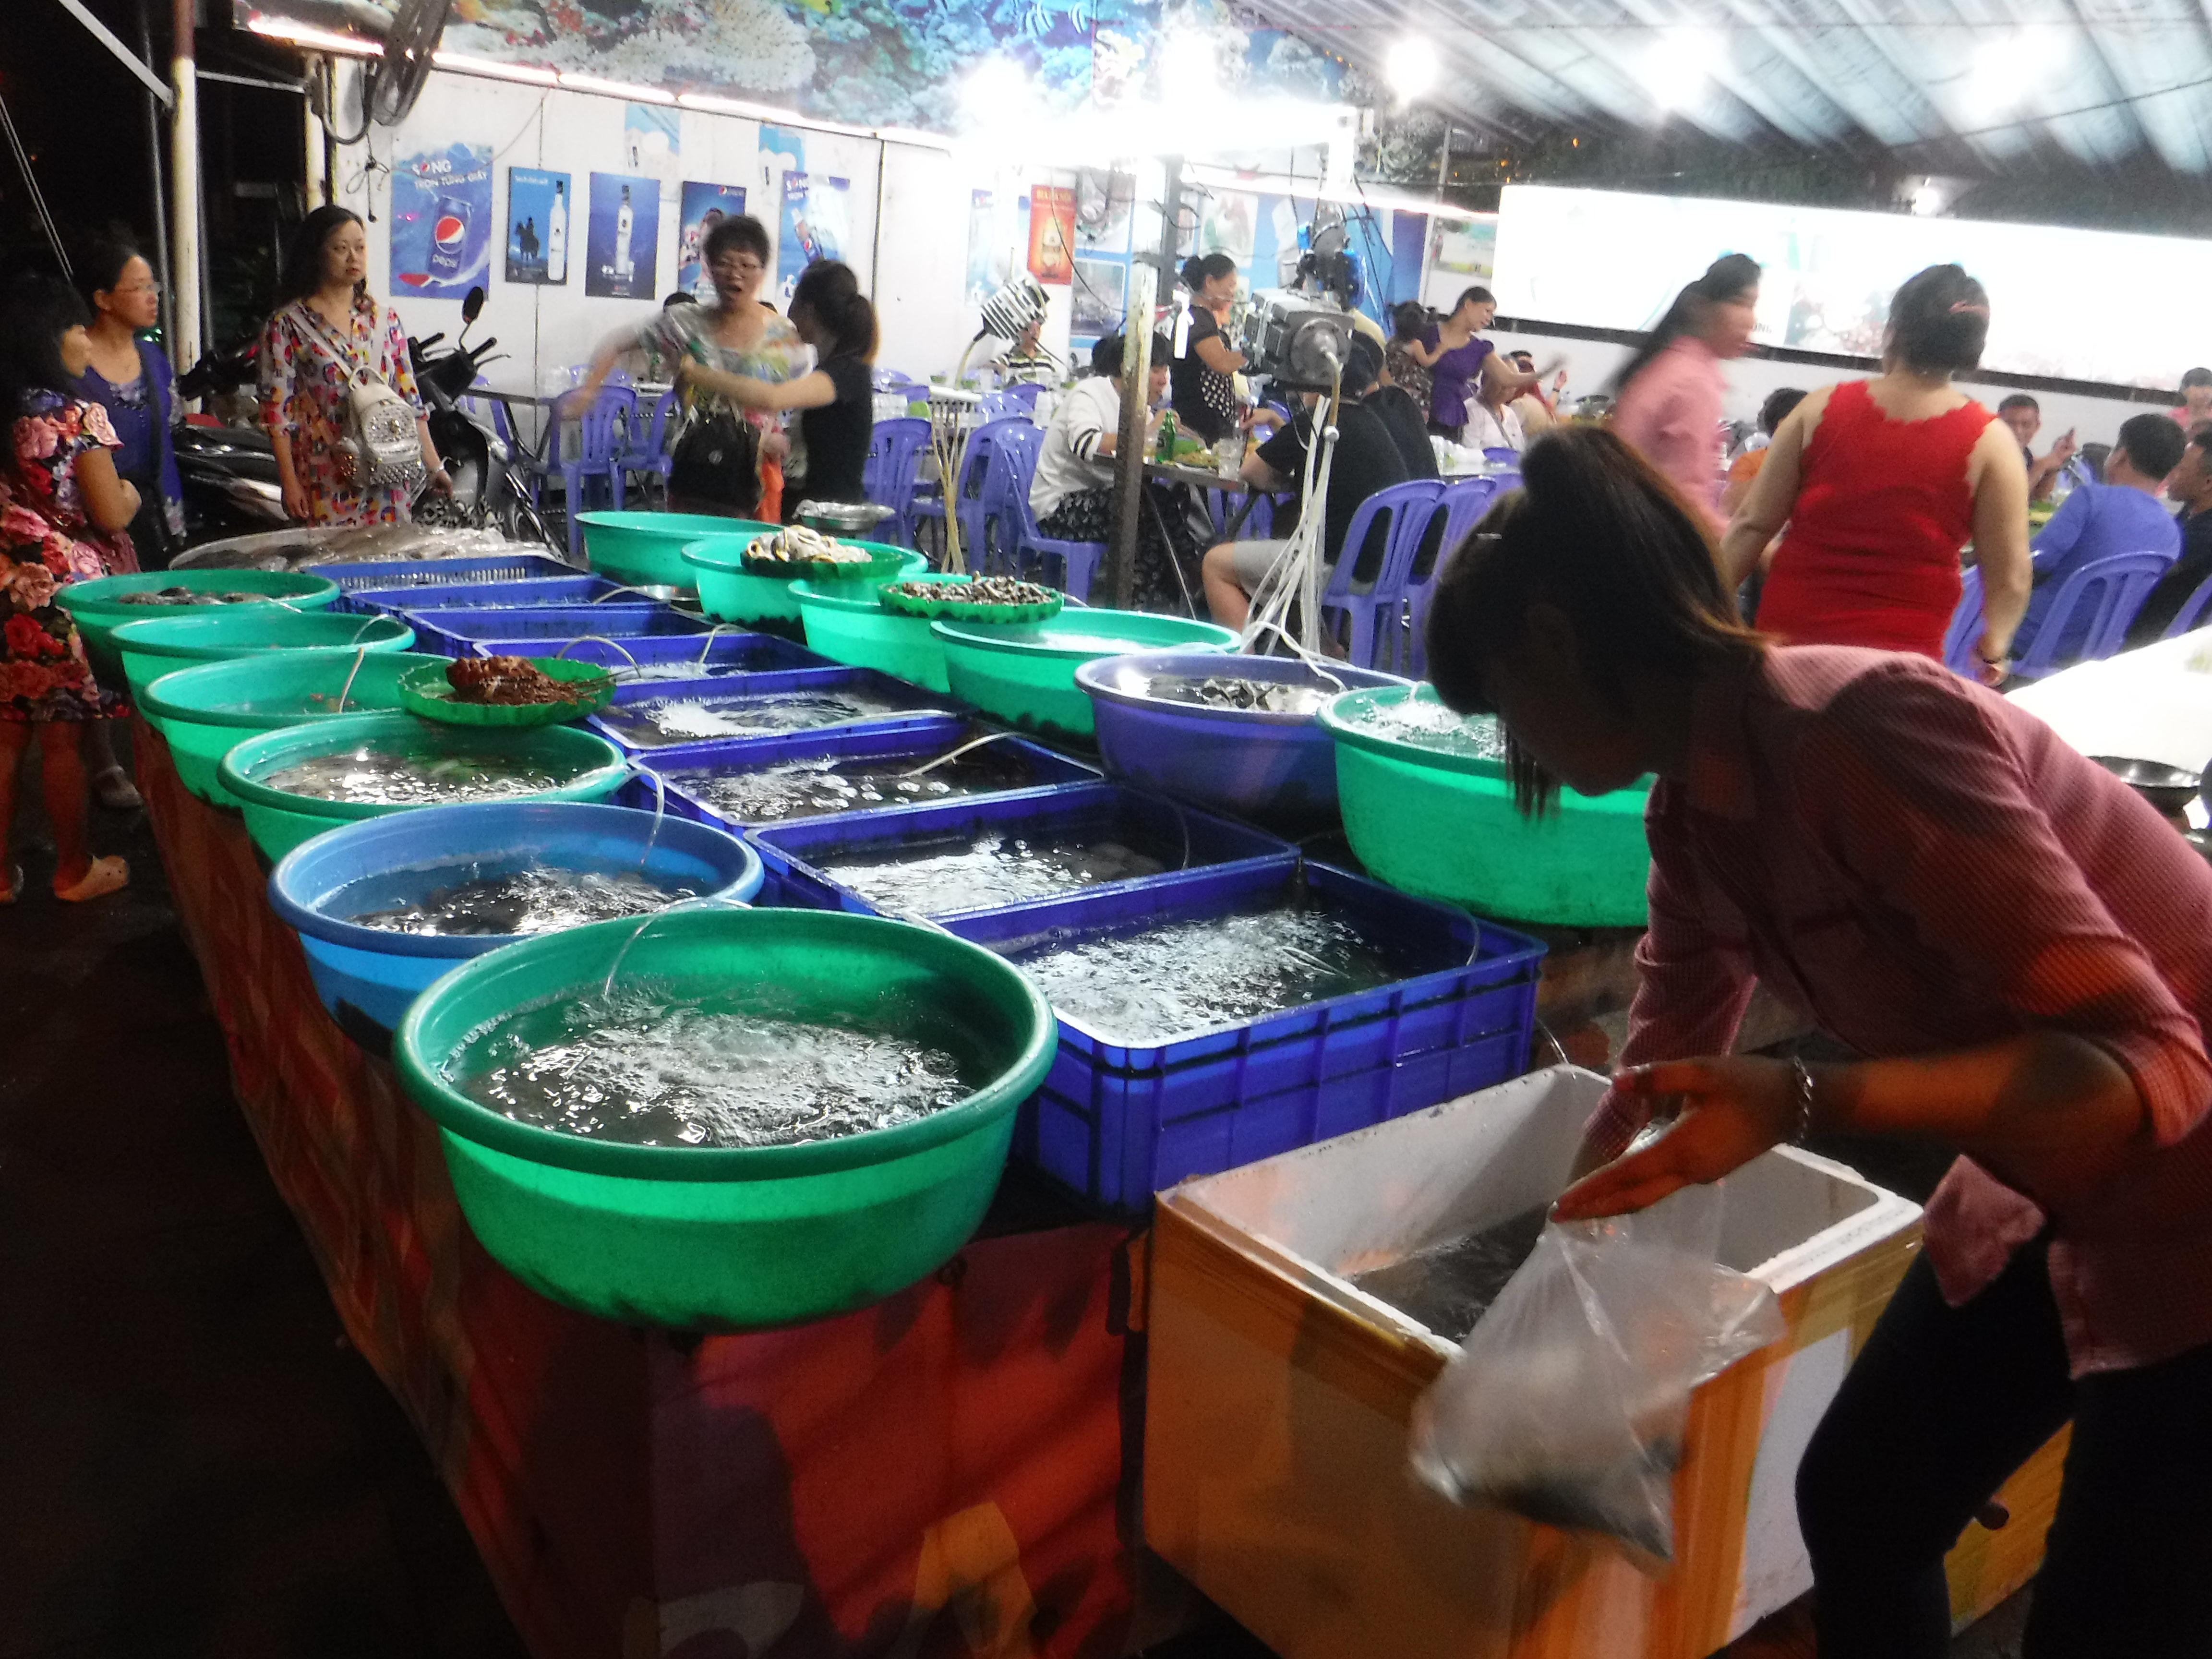 Vybíráme si mořské plody